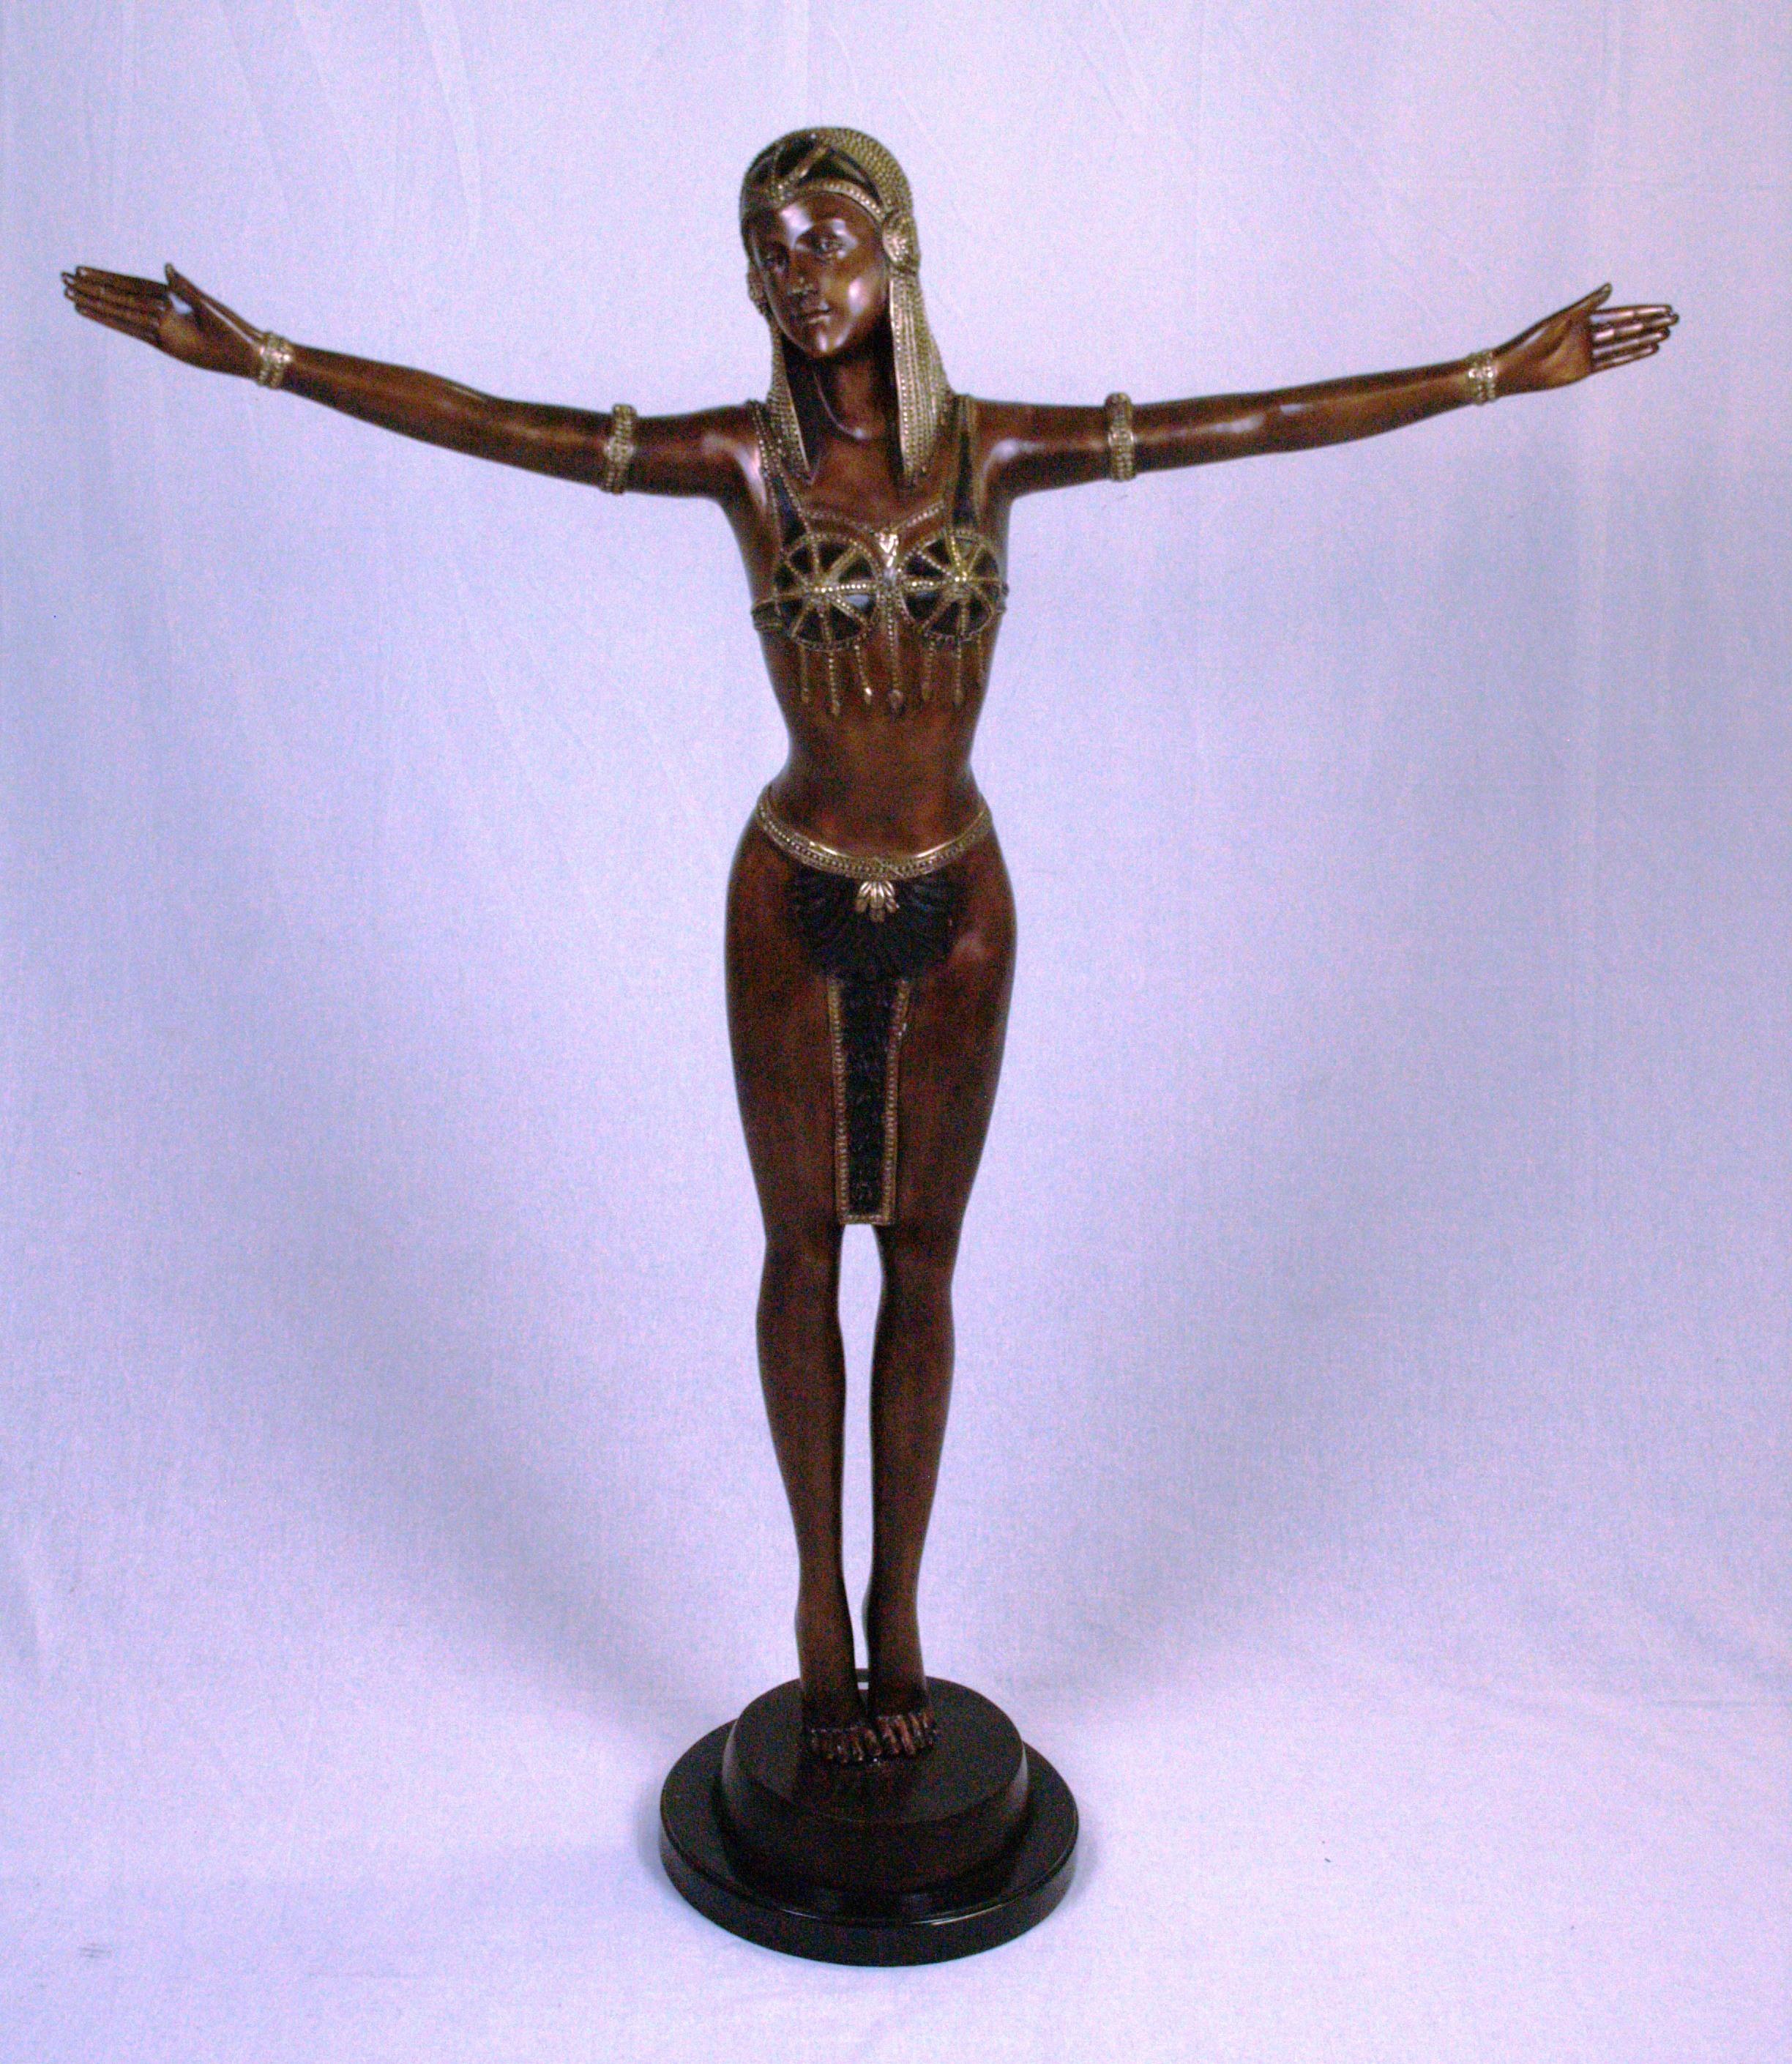 Große Bronze Figur Tänzerin Art Sculptures Auctionet